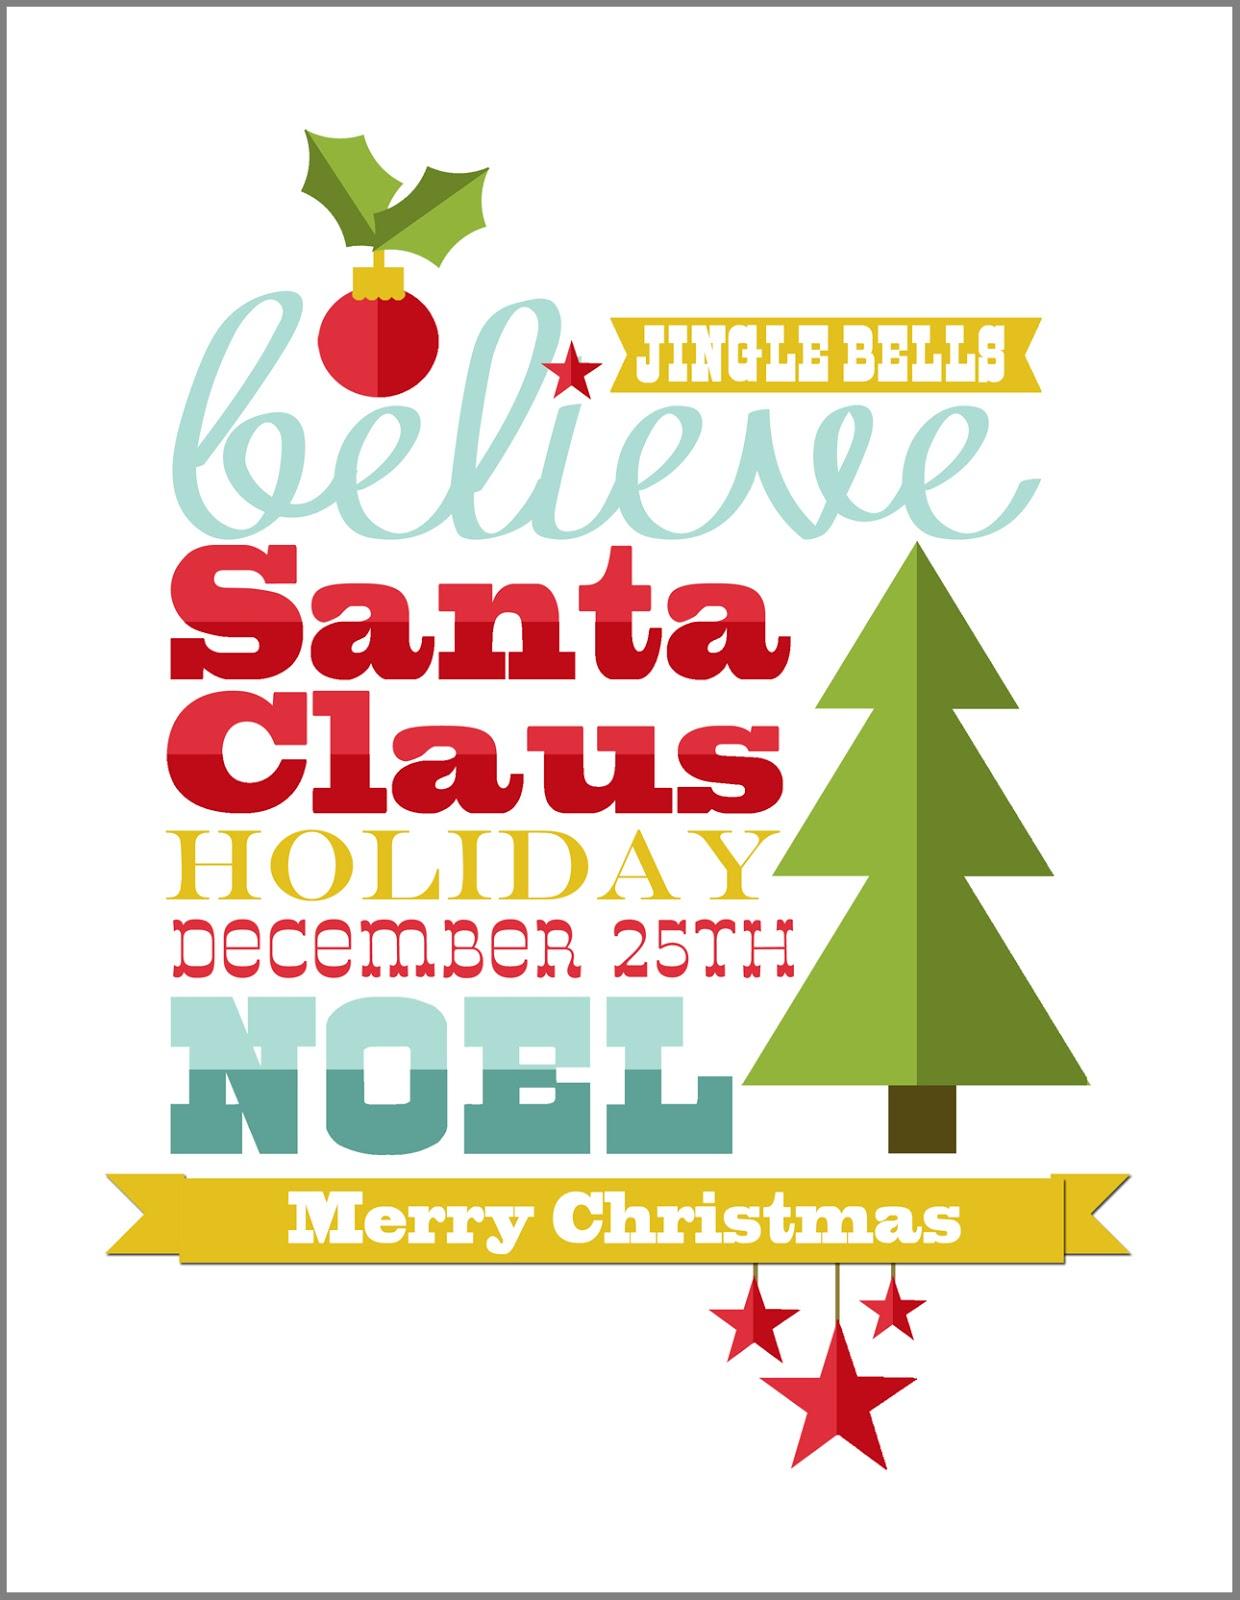 http://3.bp.blogspot.com/--uvpfdIAjUQ/VGH2_wRJIBI/AAAAAAAATbs/S8r_2kcxp0Y/s1600/Christmas-Printable.jpg